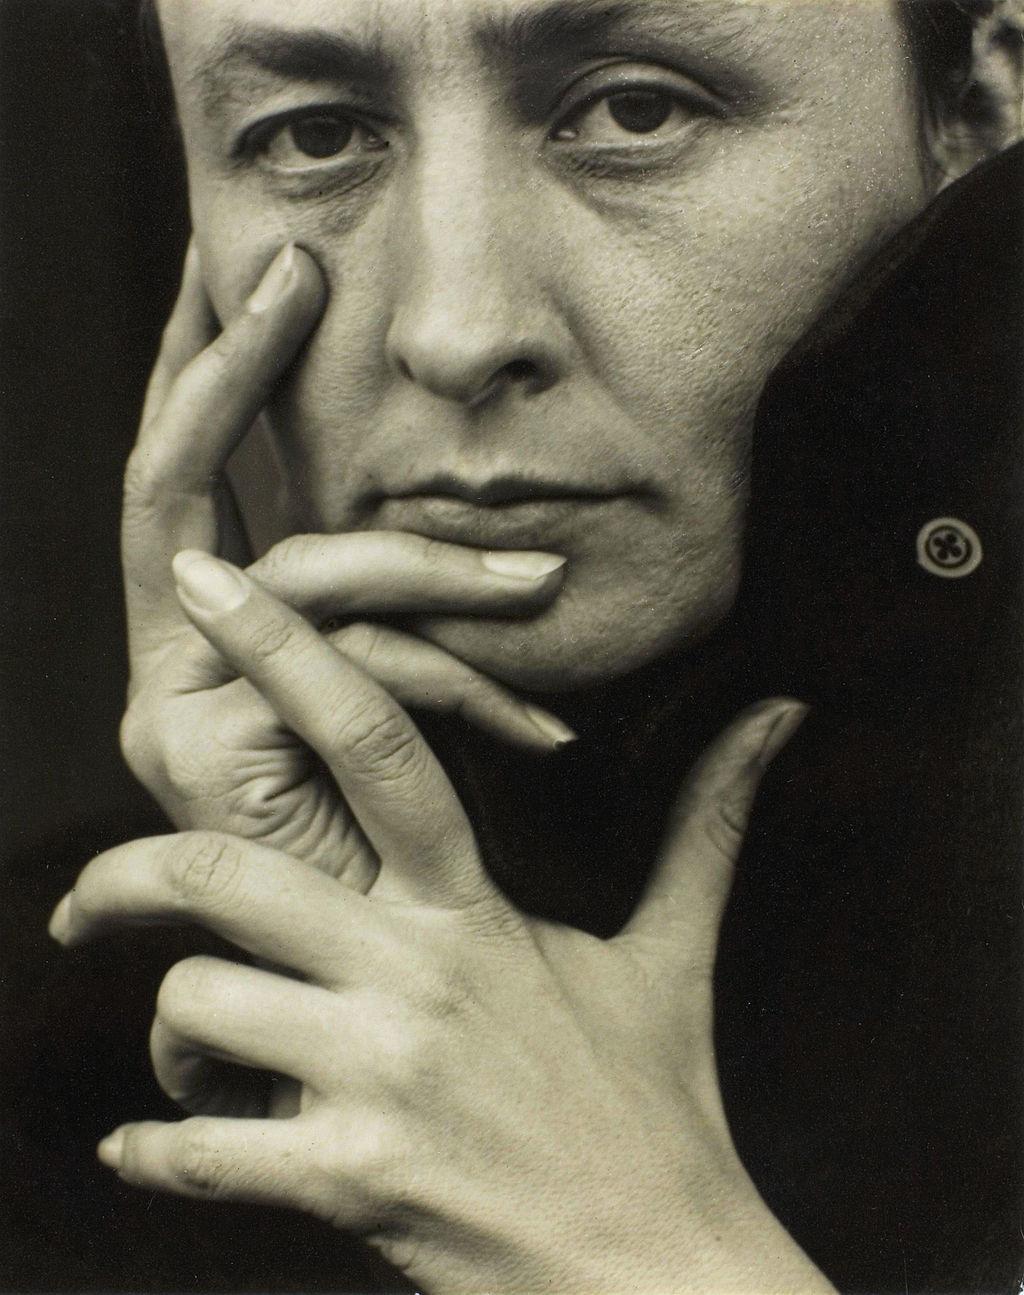 A.Stieglitz O'Keeffe-(hands)